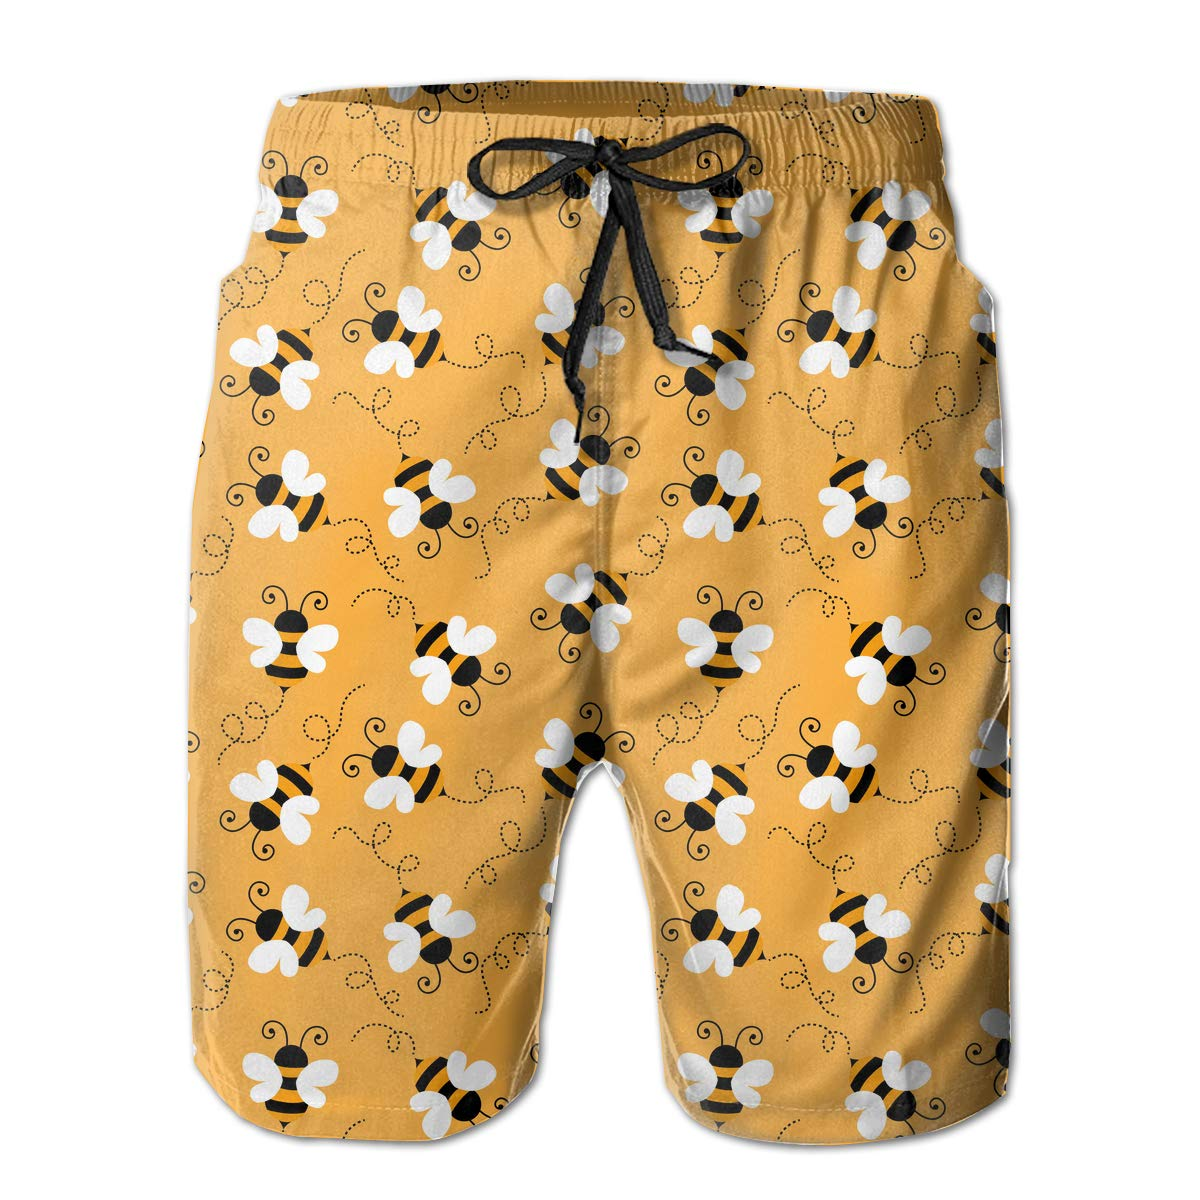 Polyester Bee Pattern Board Shorts with Pockets Xk7@KU Mens 3D Printed Beach Shorts